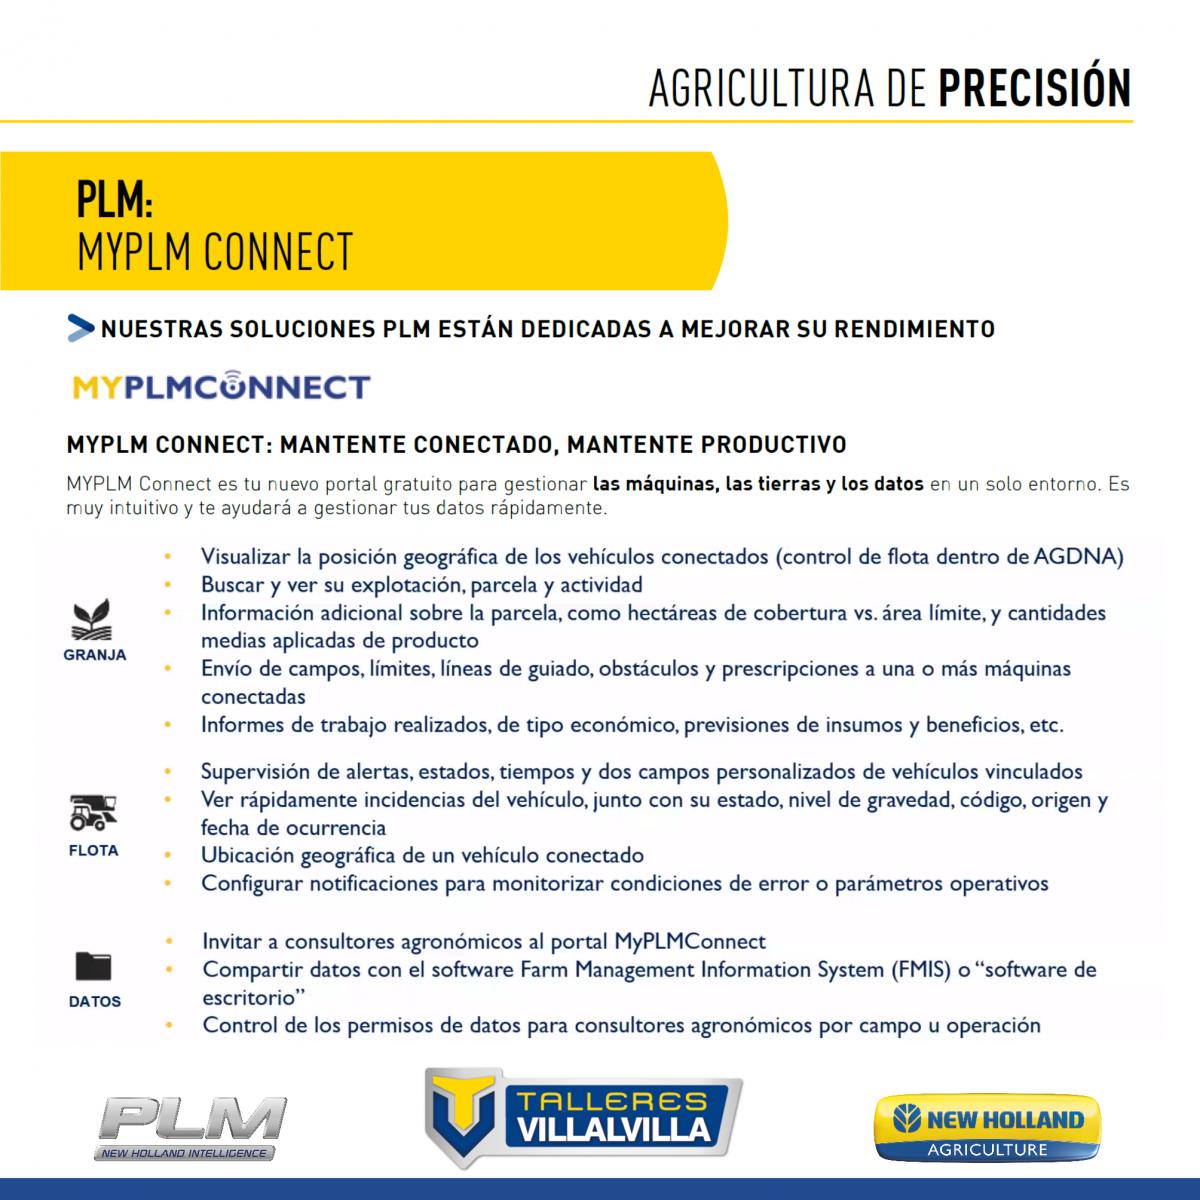 MYPLM CONNECT